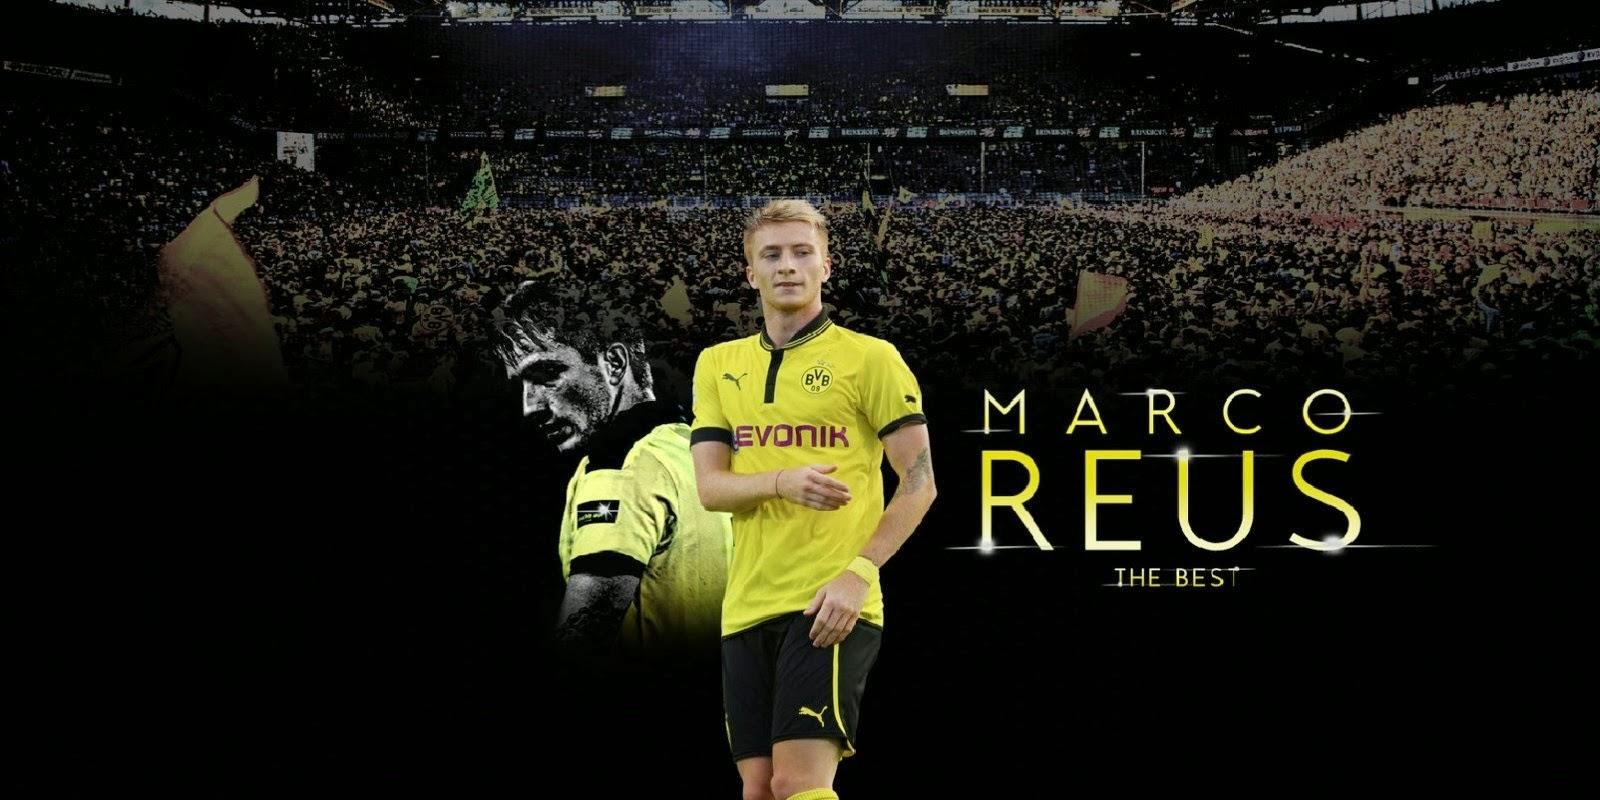 Marco Reus Of Borussia Dortmund Wallpaper T